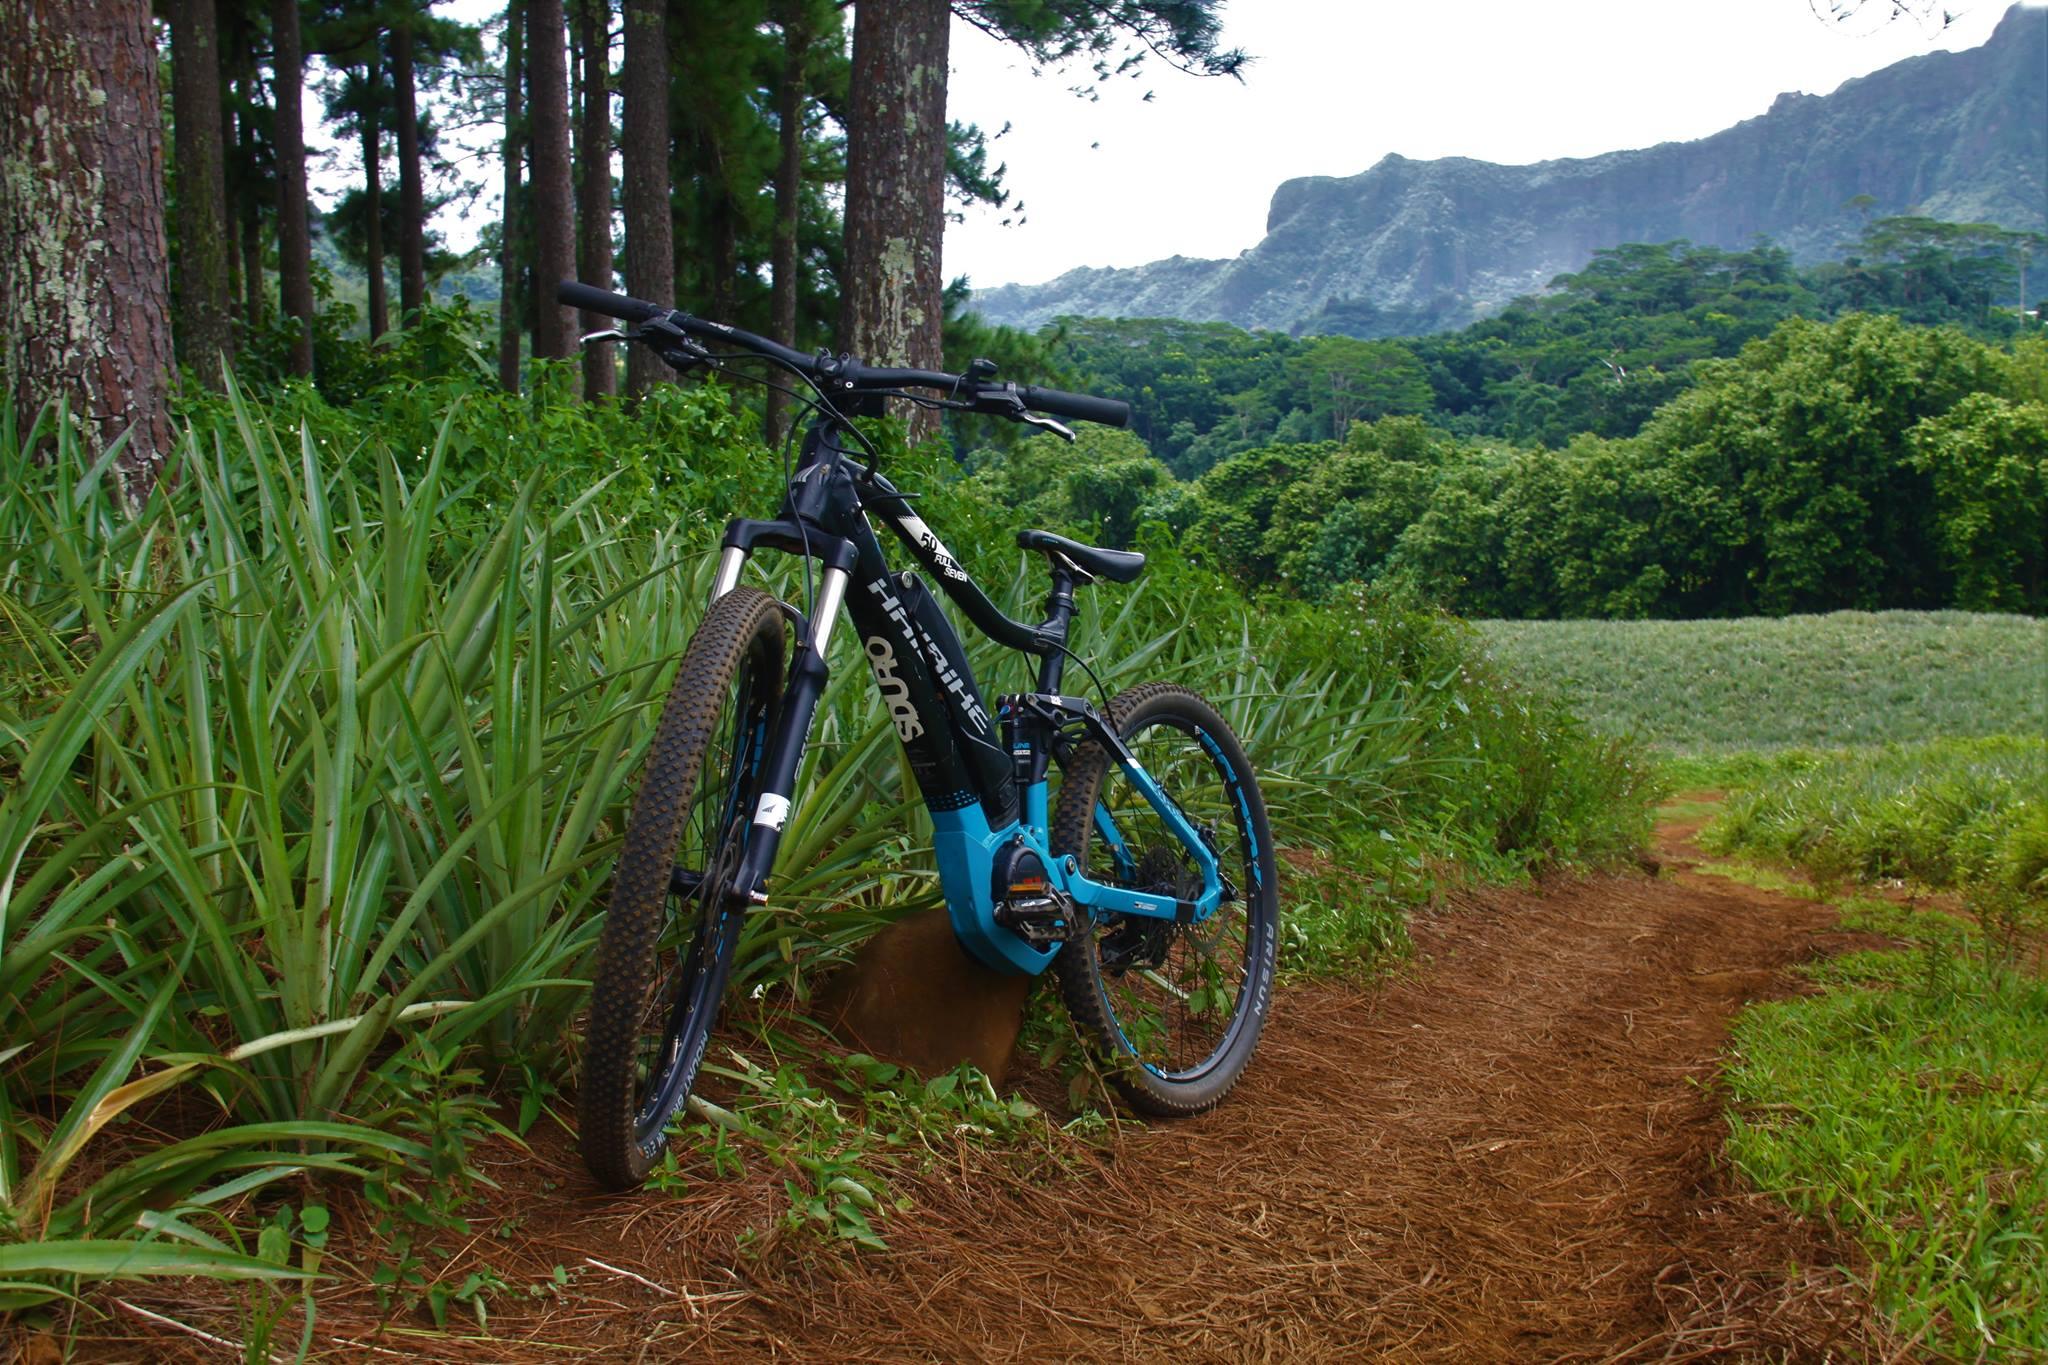 Moorea Electik Bike: To explore the inlands